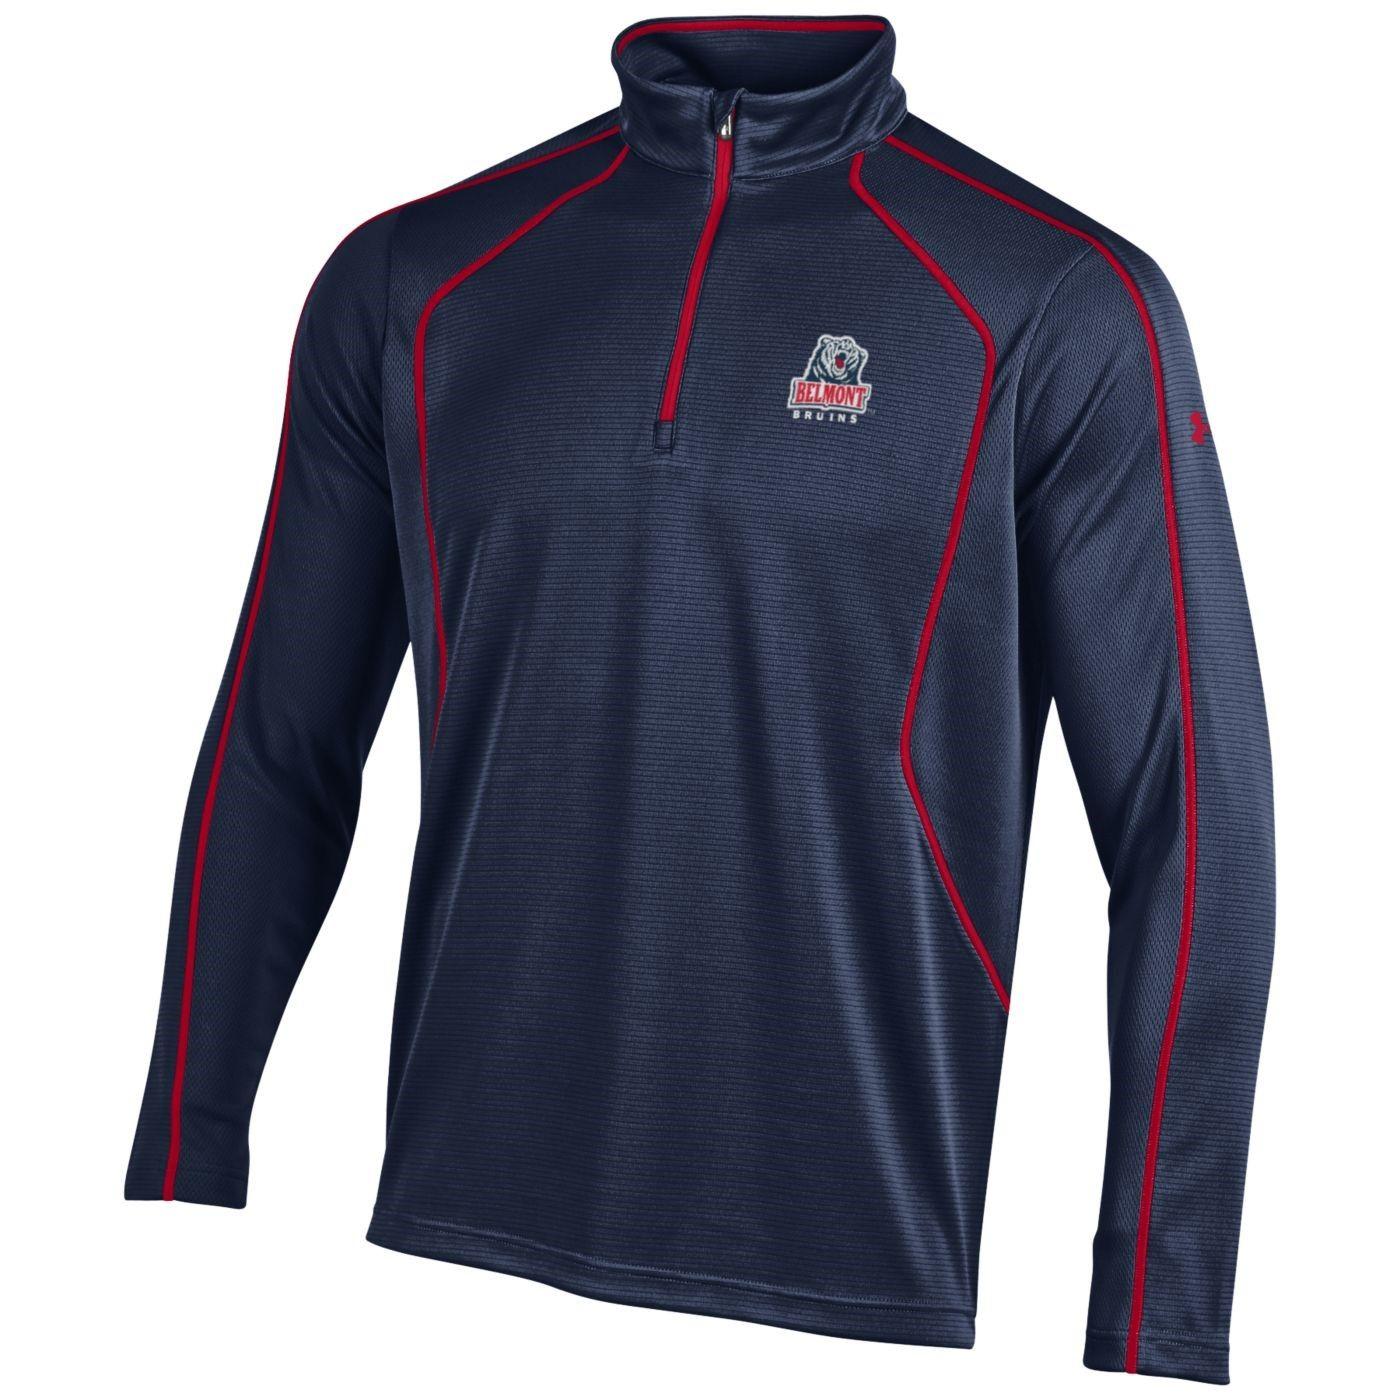 5804c4aa UA SMU 1/4 ZIP | Belmont University Apparel & Gifts | Long sleeve ...